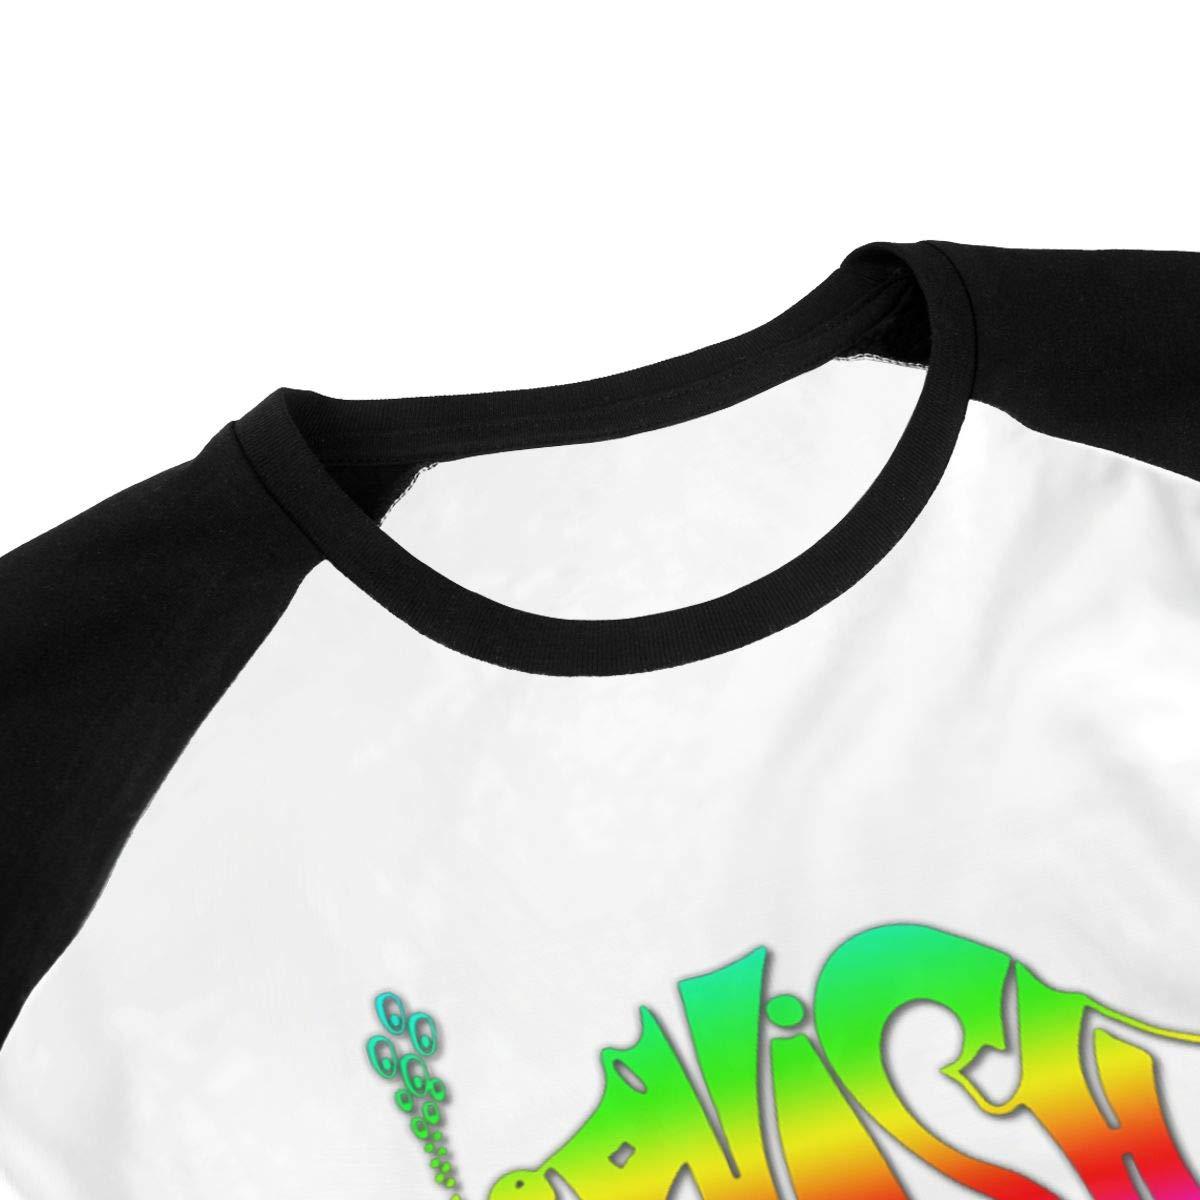 Phish Music Band Logo Toddler Baby Girls Boys Short Sleeve Shirts Raglan Shirt Baseball Tee Cotton T-Shirt